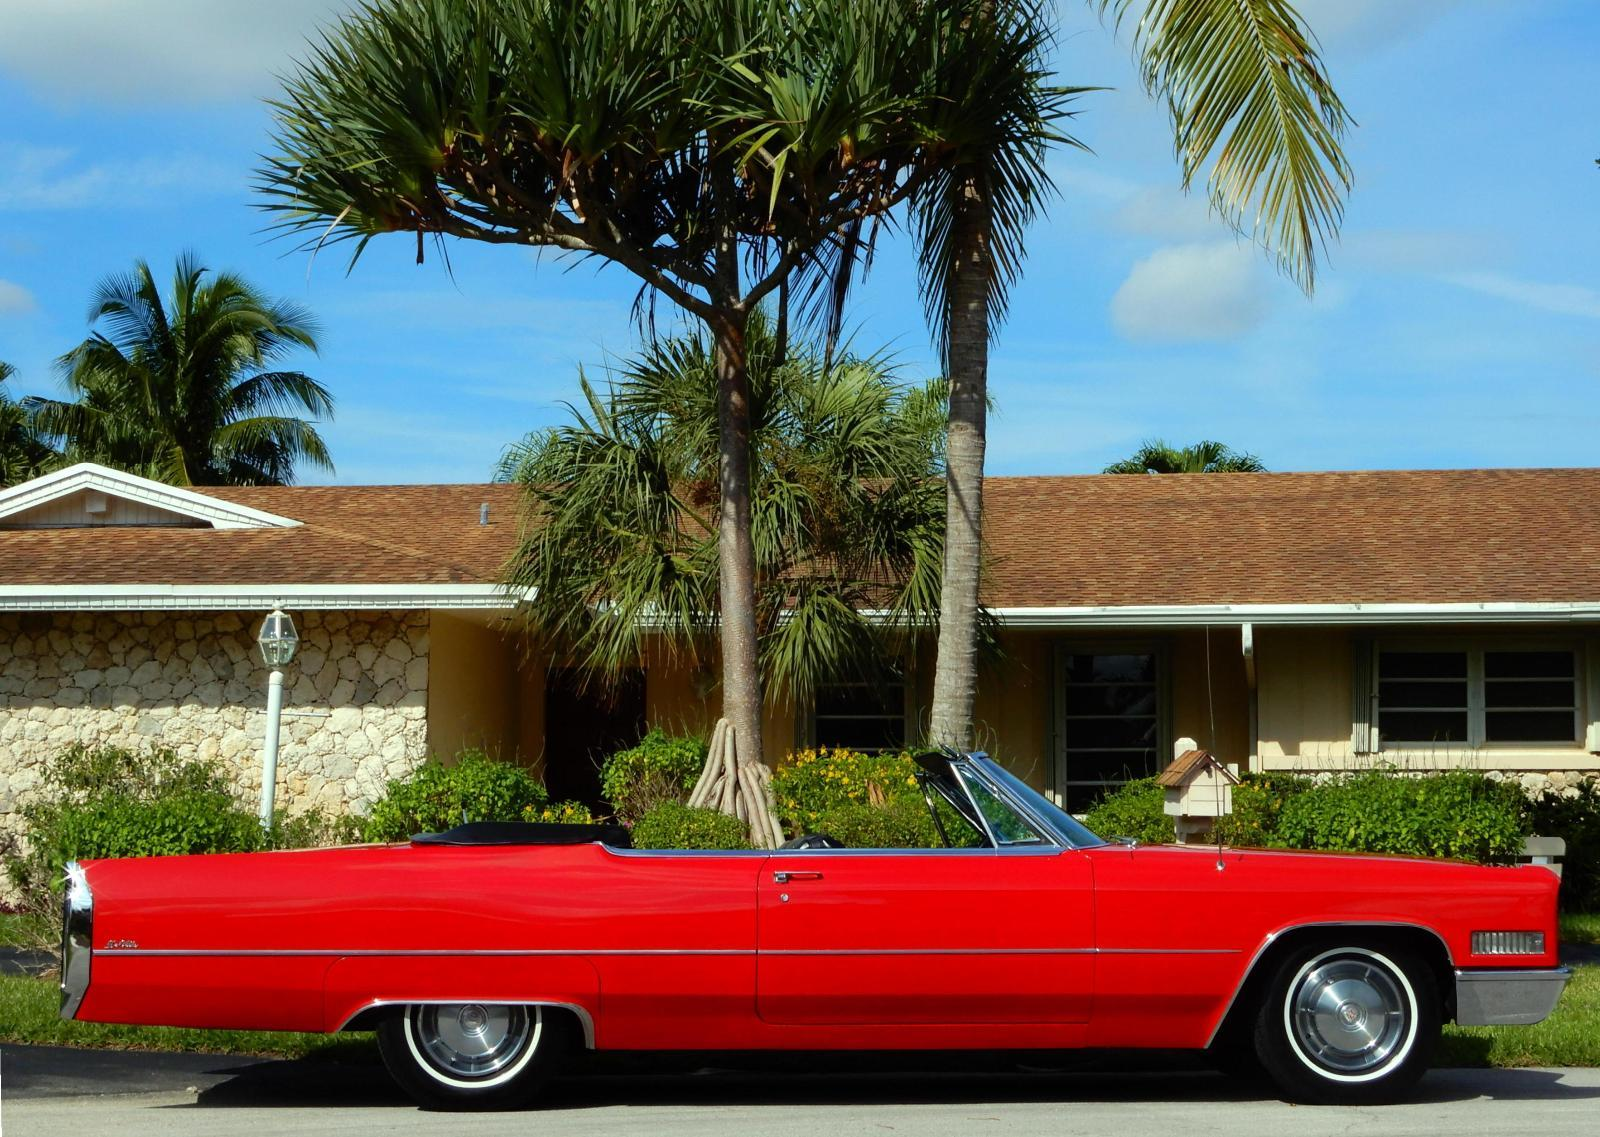 1966 Cadillac DeVille Convertible- 31,850 ACTUAL MILES- COLD A/C